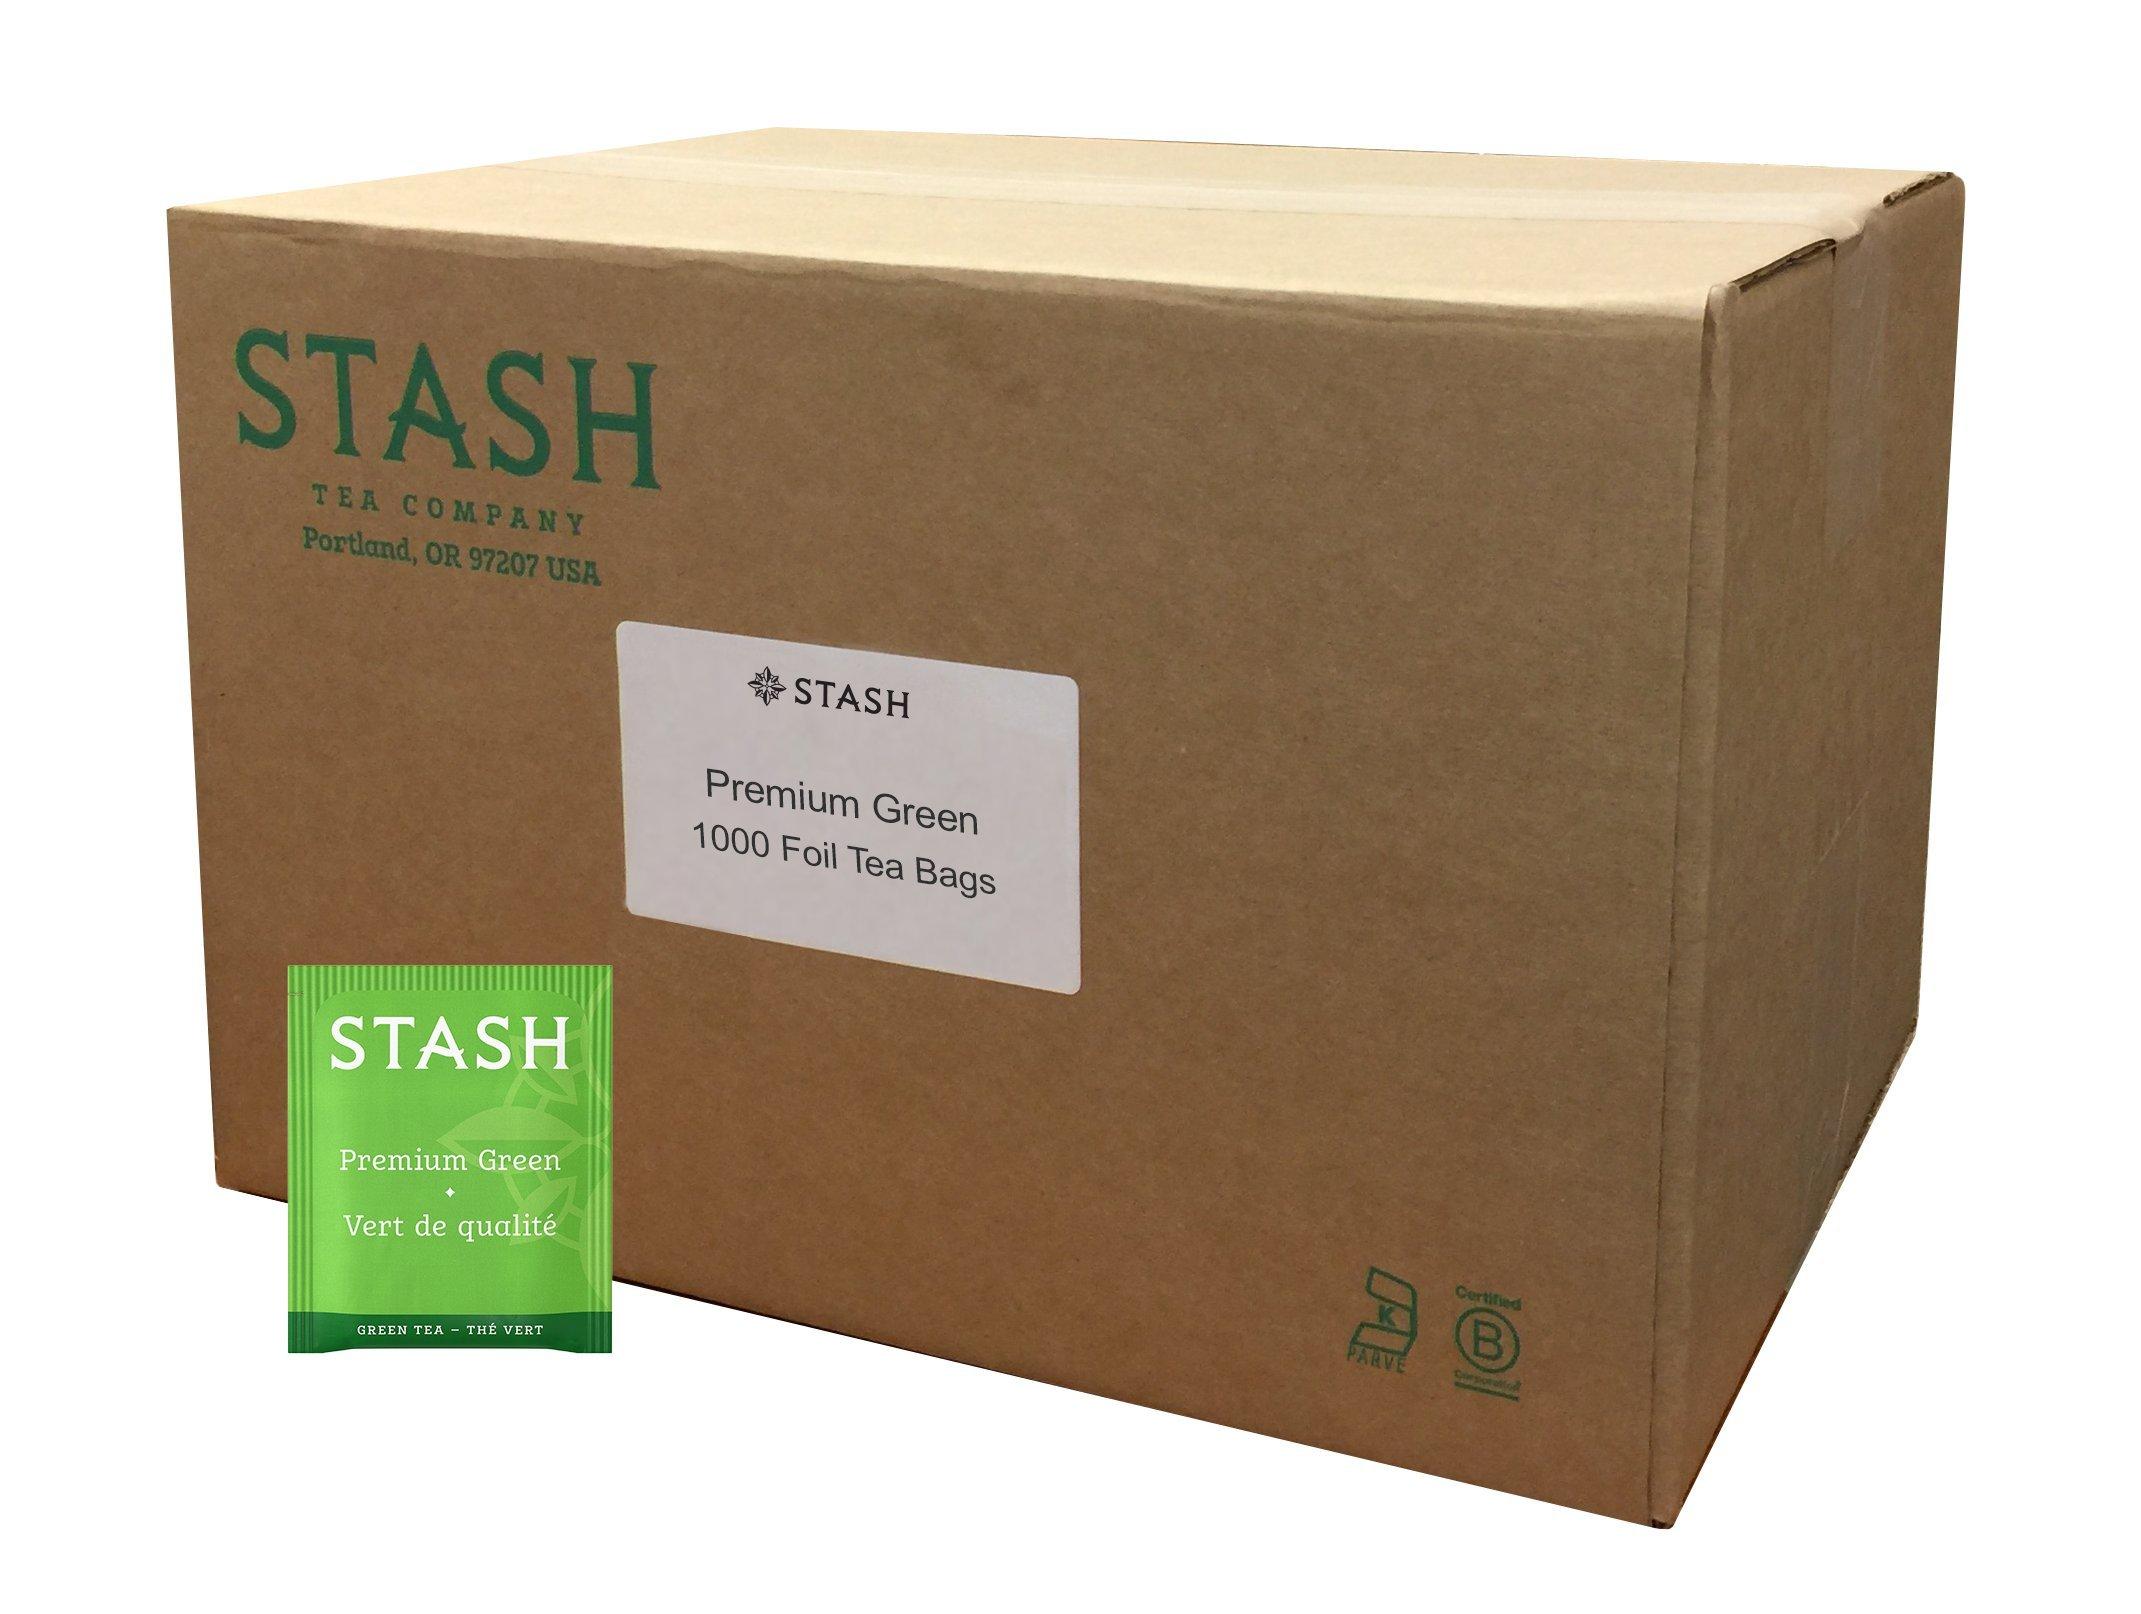 Stash Tea Premium Green Tea 1000 Count Box of Tea Bags in Foil